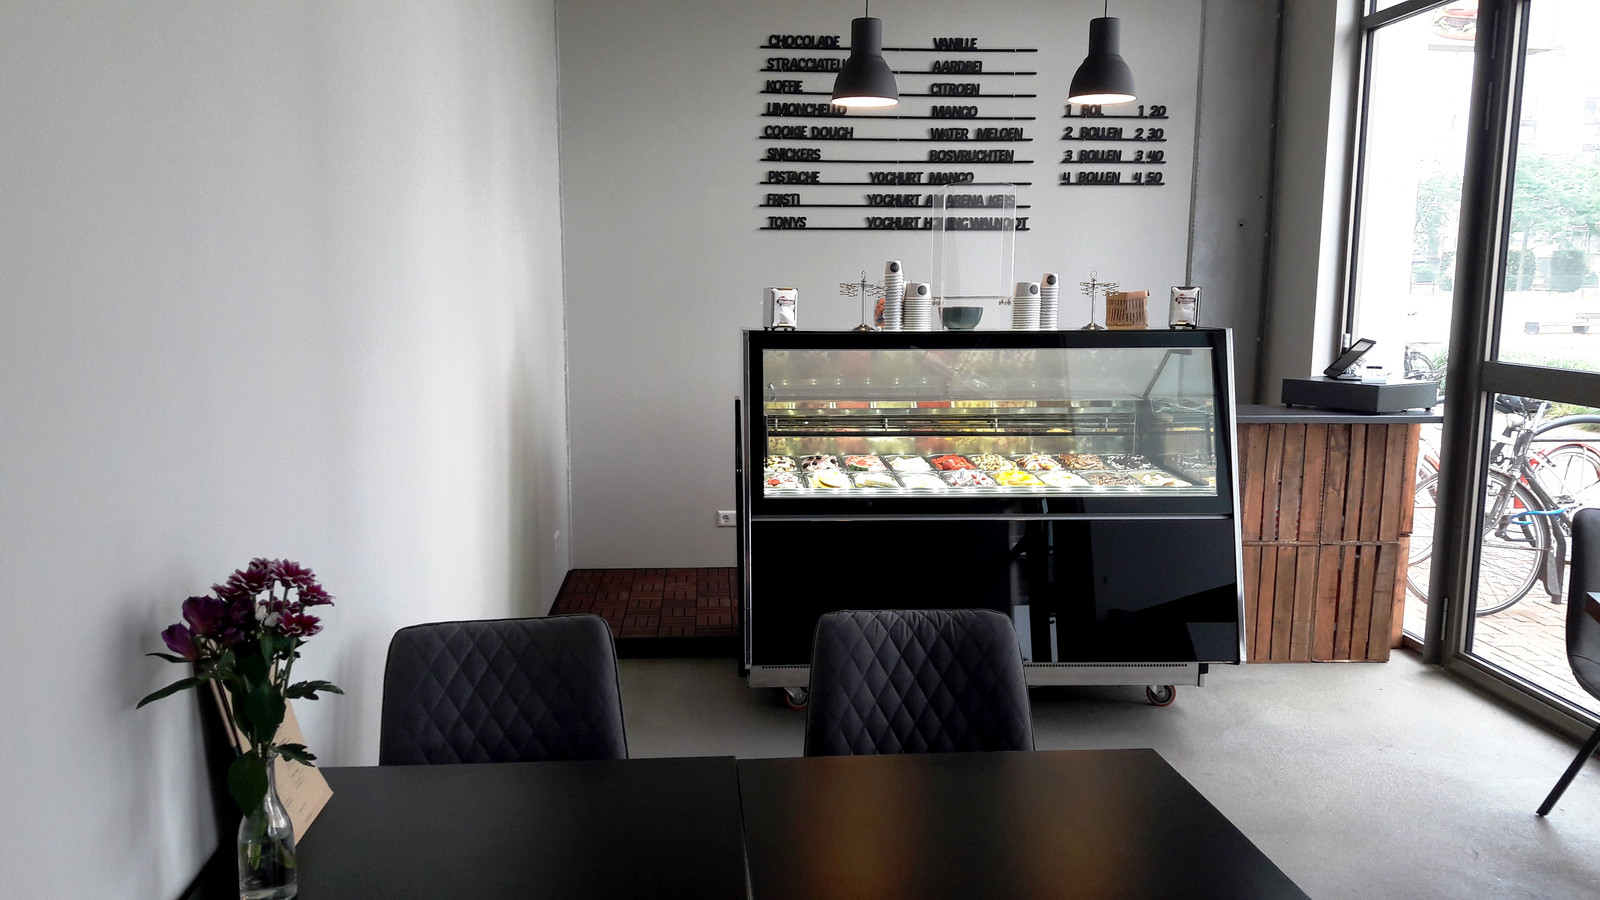 Koffie- en ijsbar L'Oro Nero in het Paleiskwartier